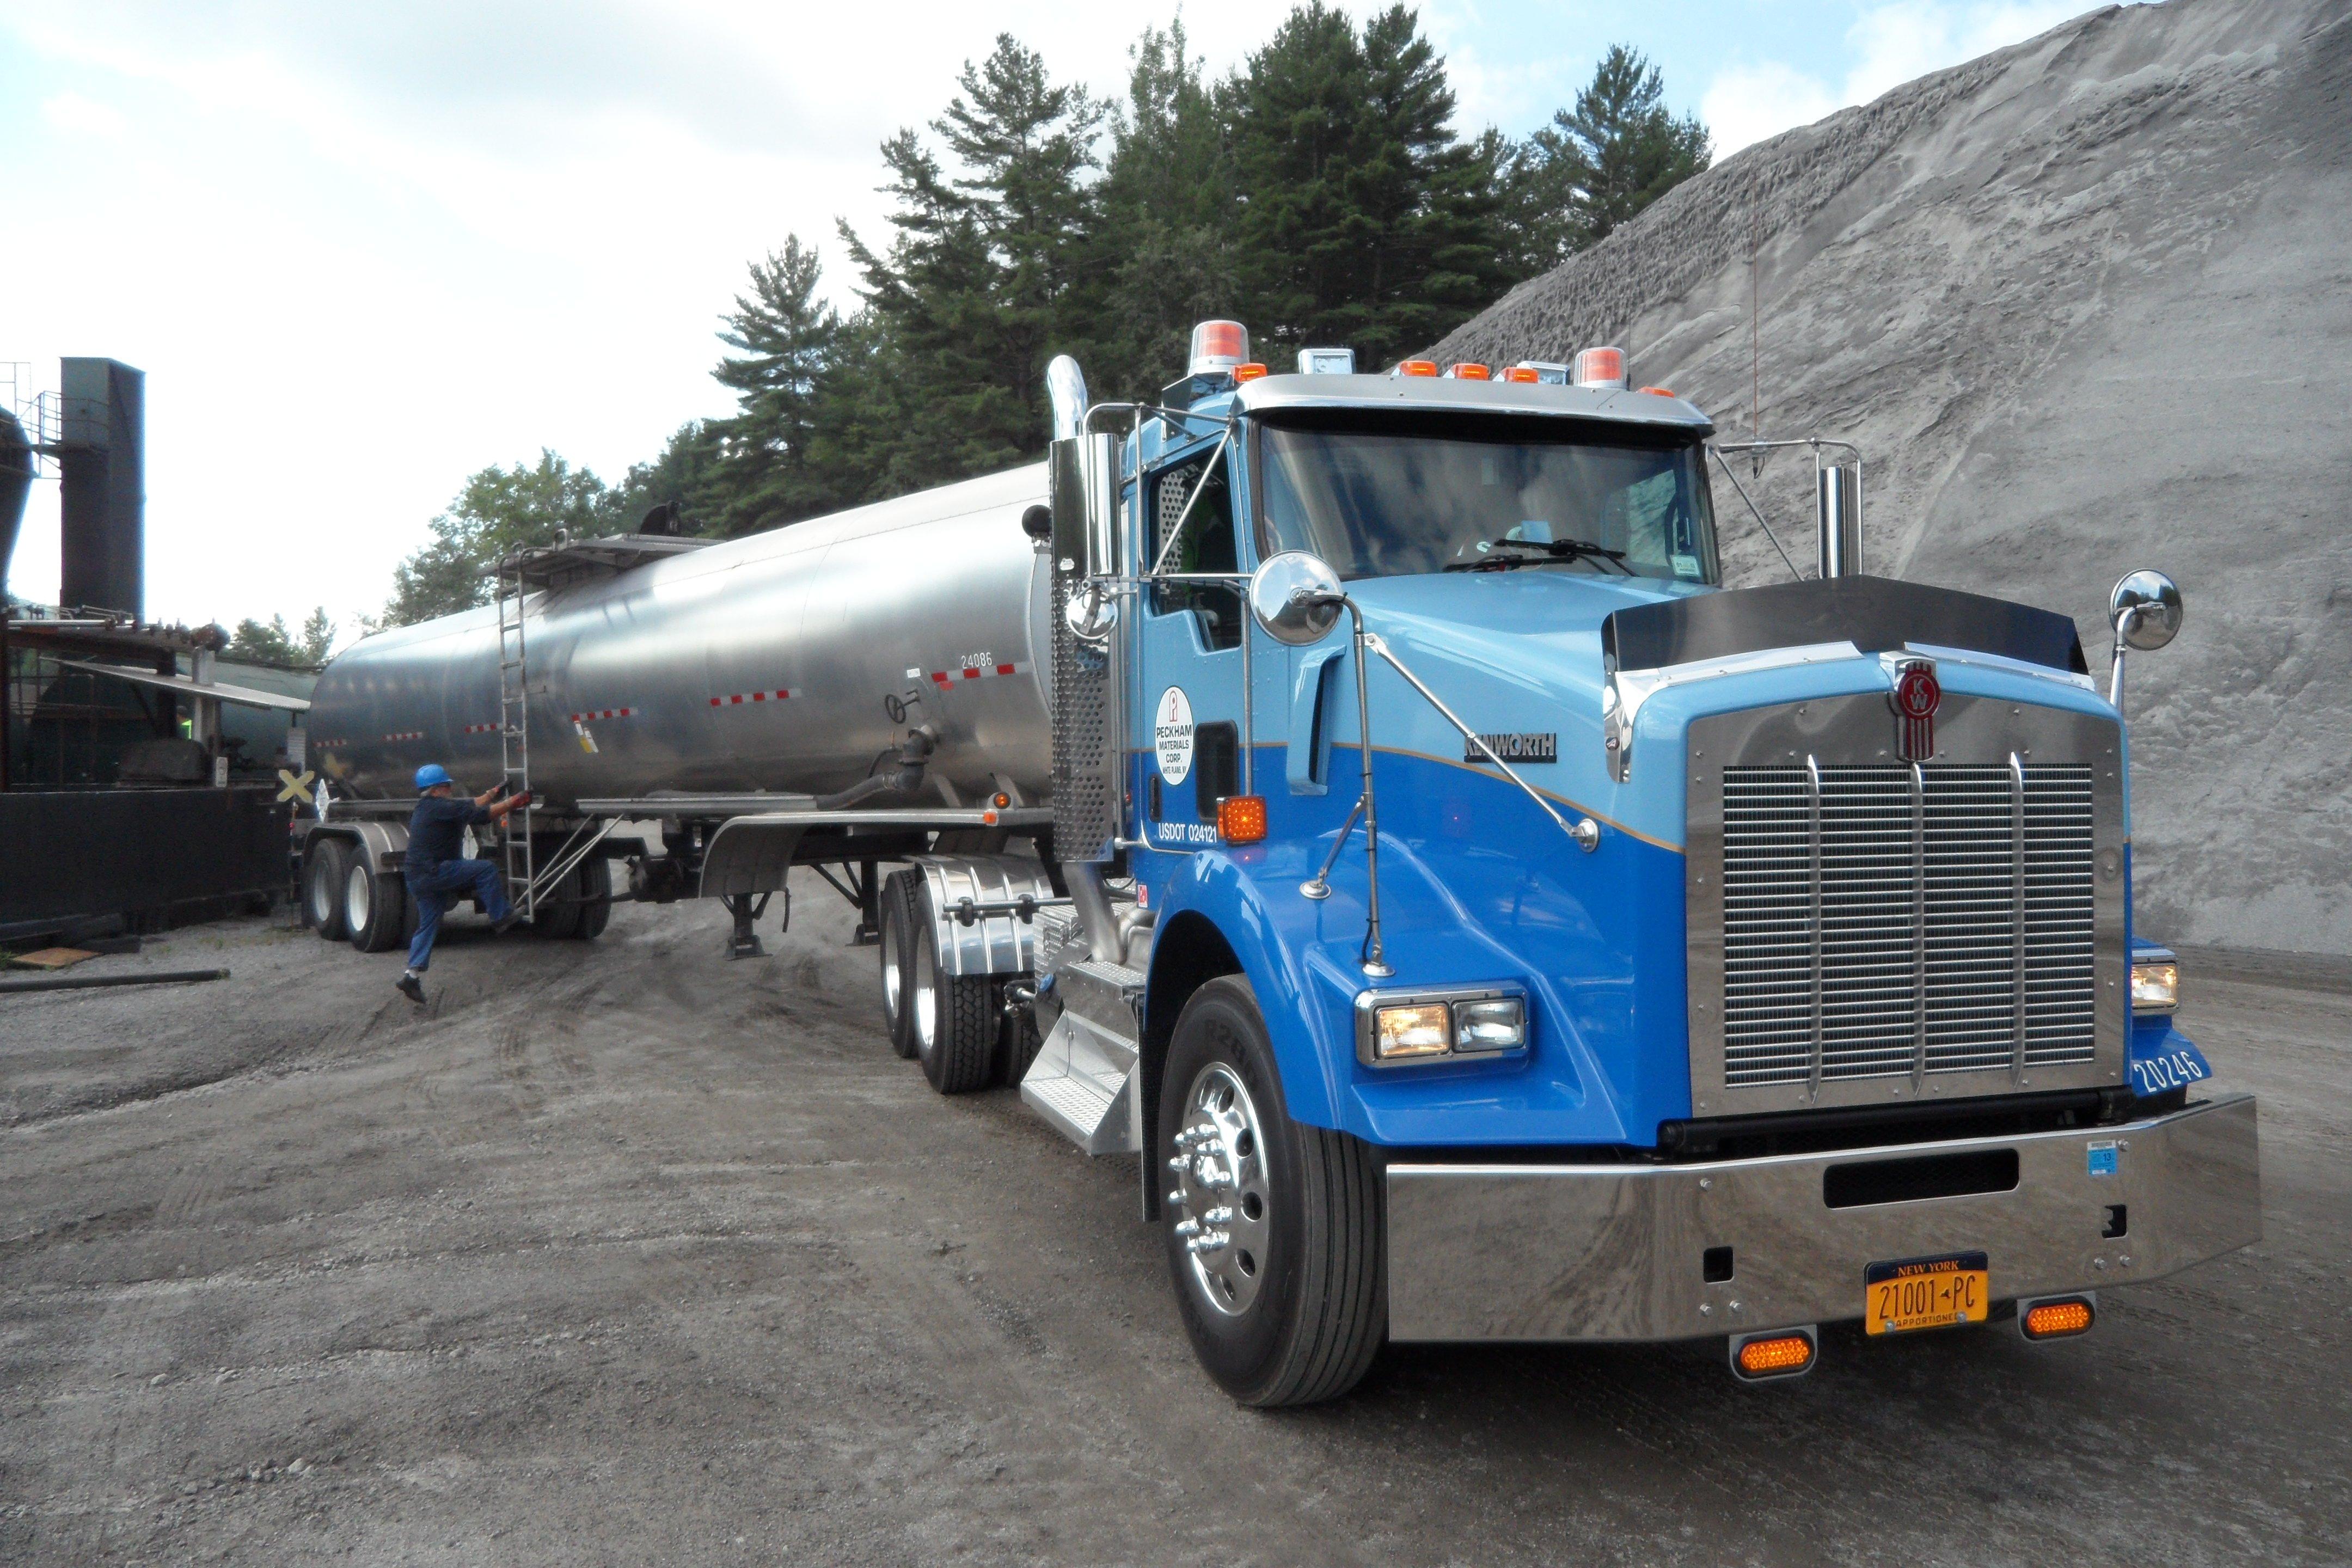 Stylish Kenworth Pulls Heavy Loads | Construction Equipment